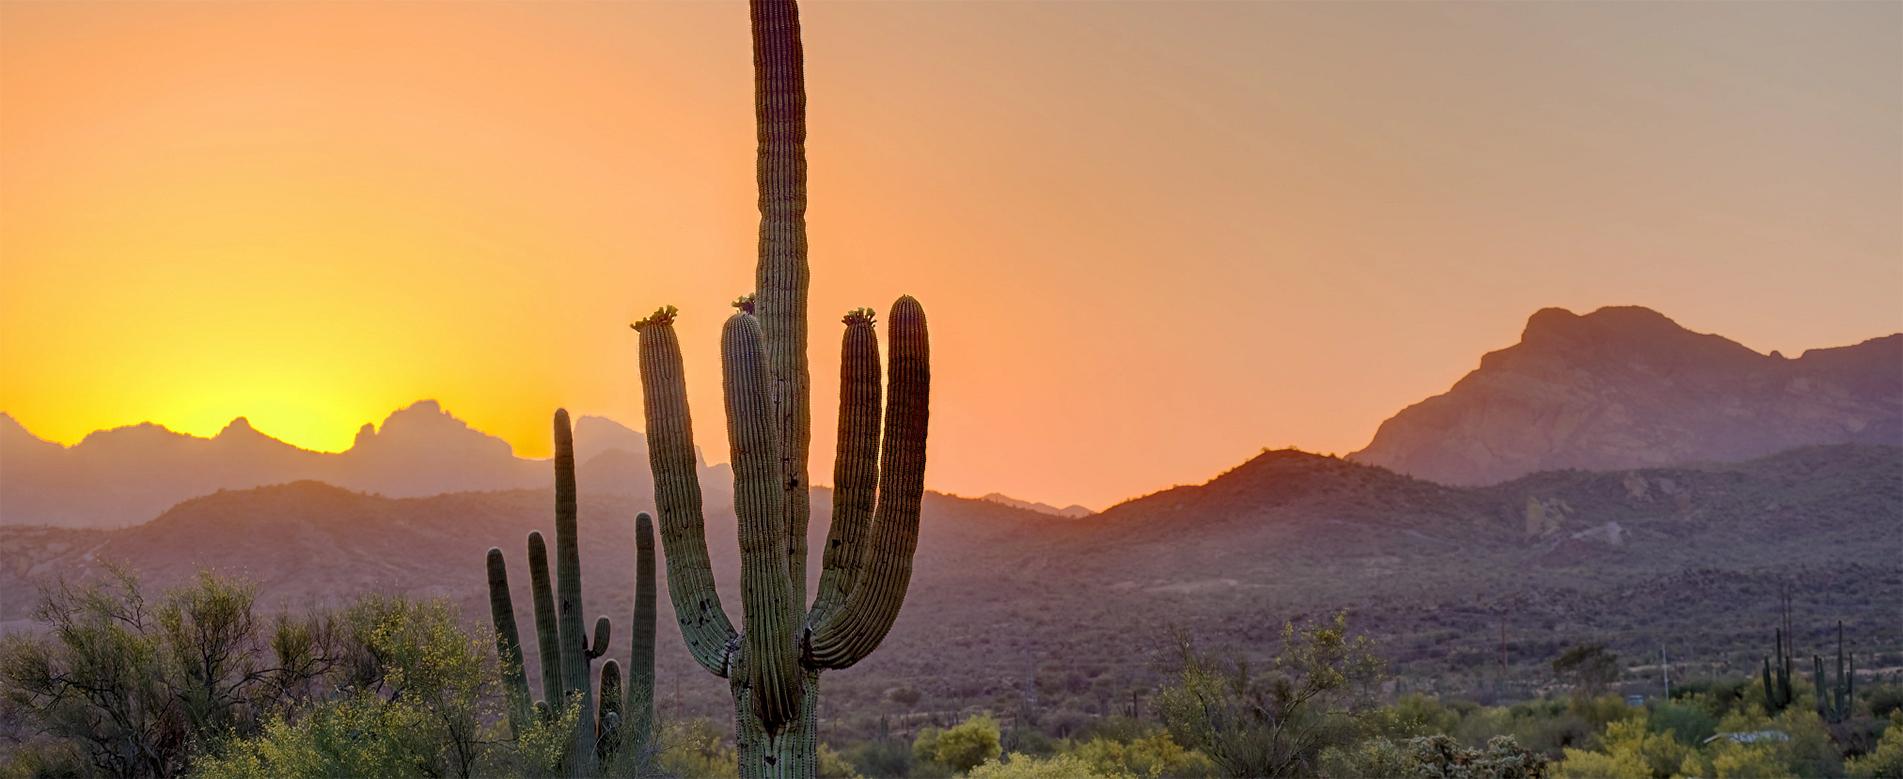 Canyon Ranch Wellness Resort Tucson, Arizona